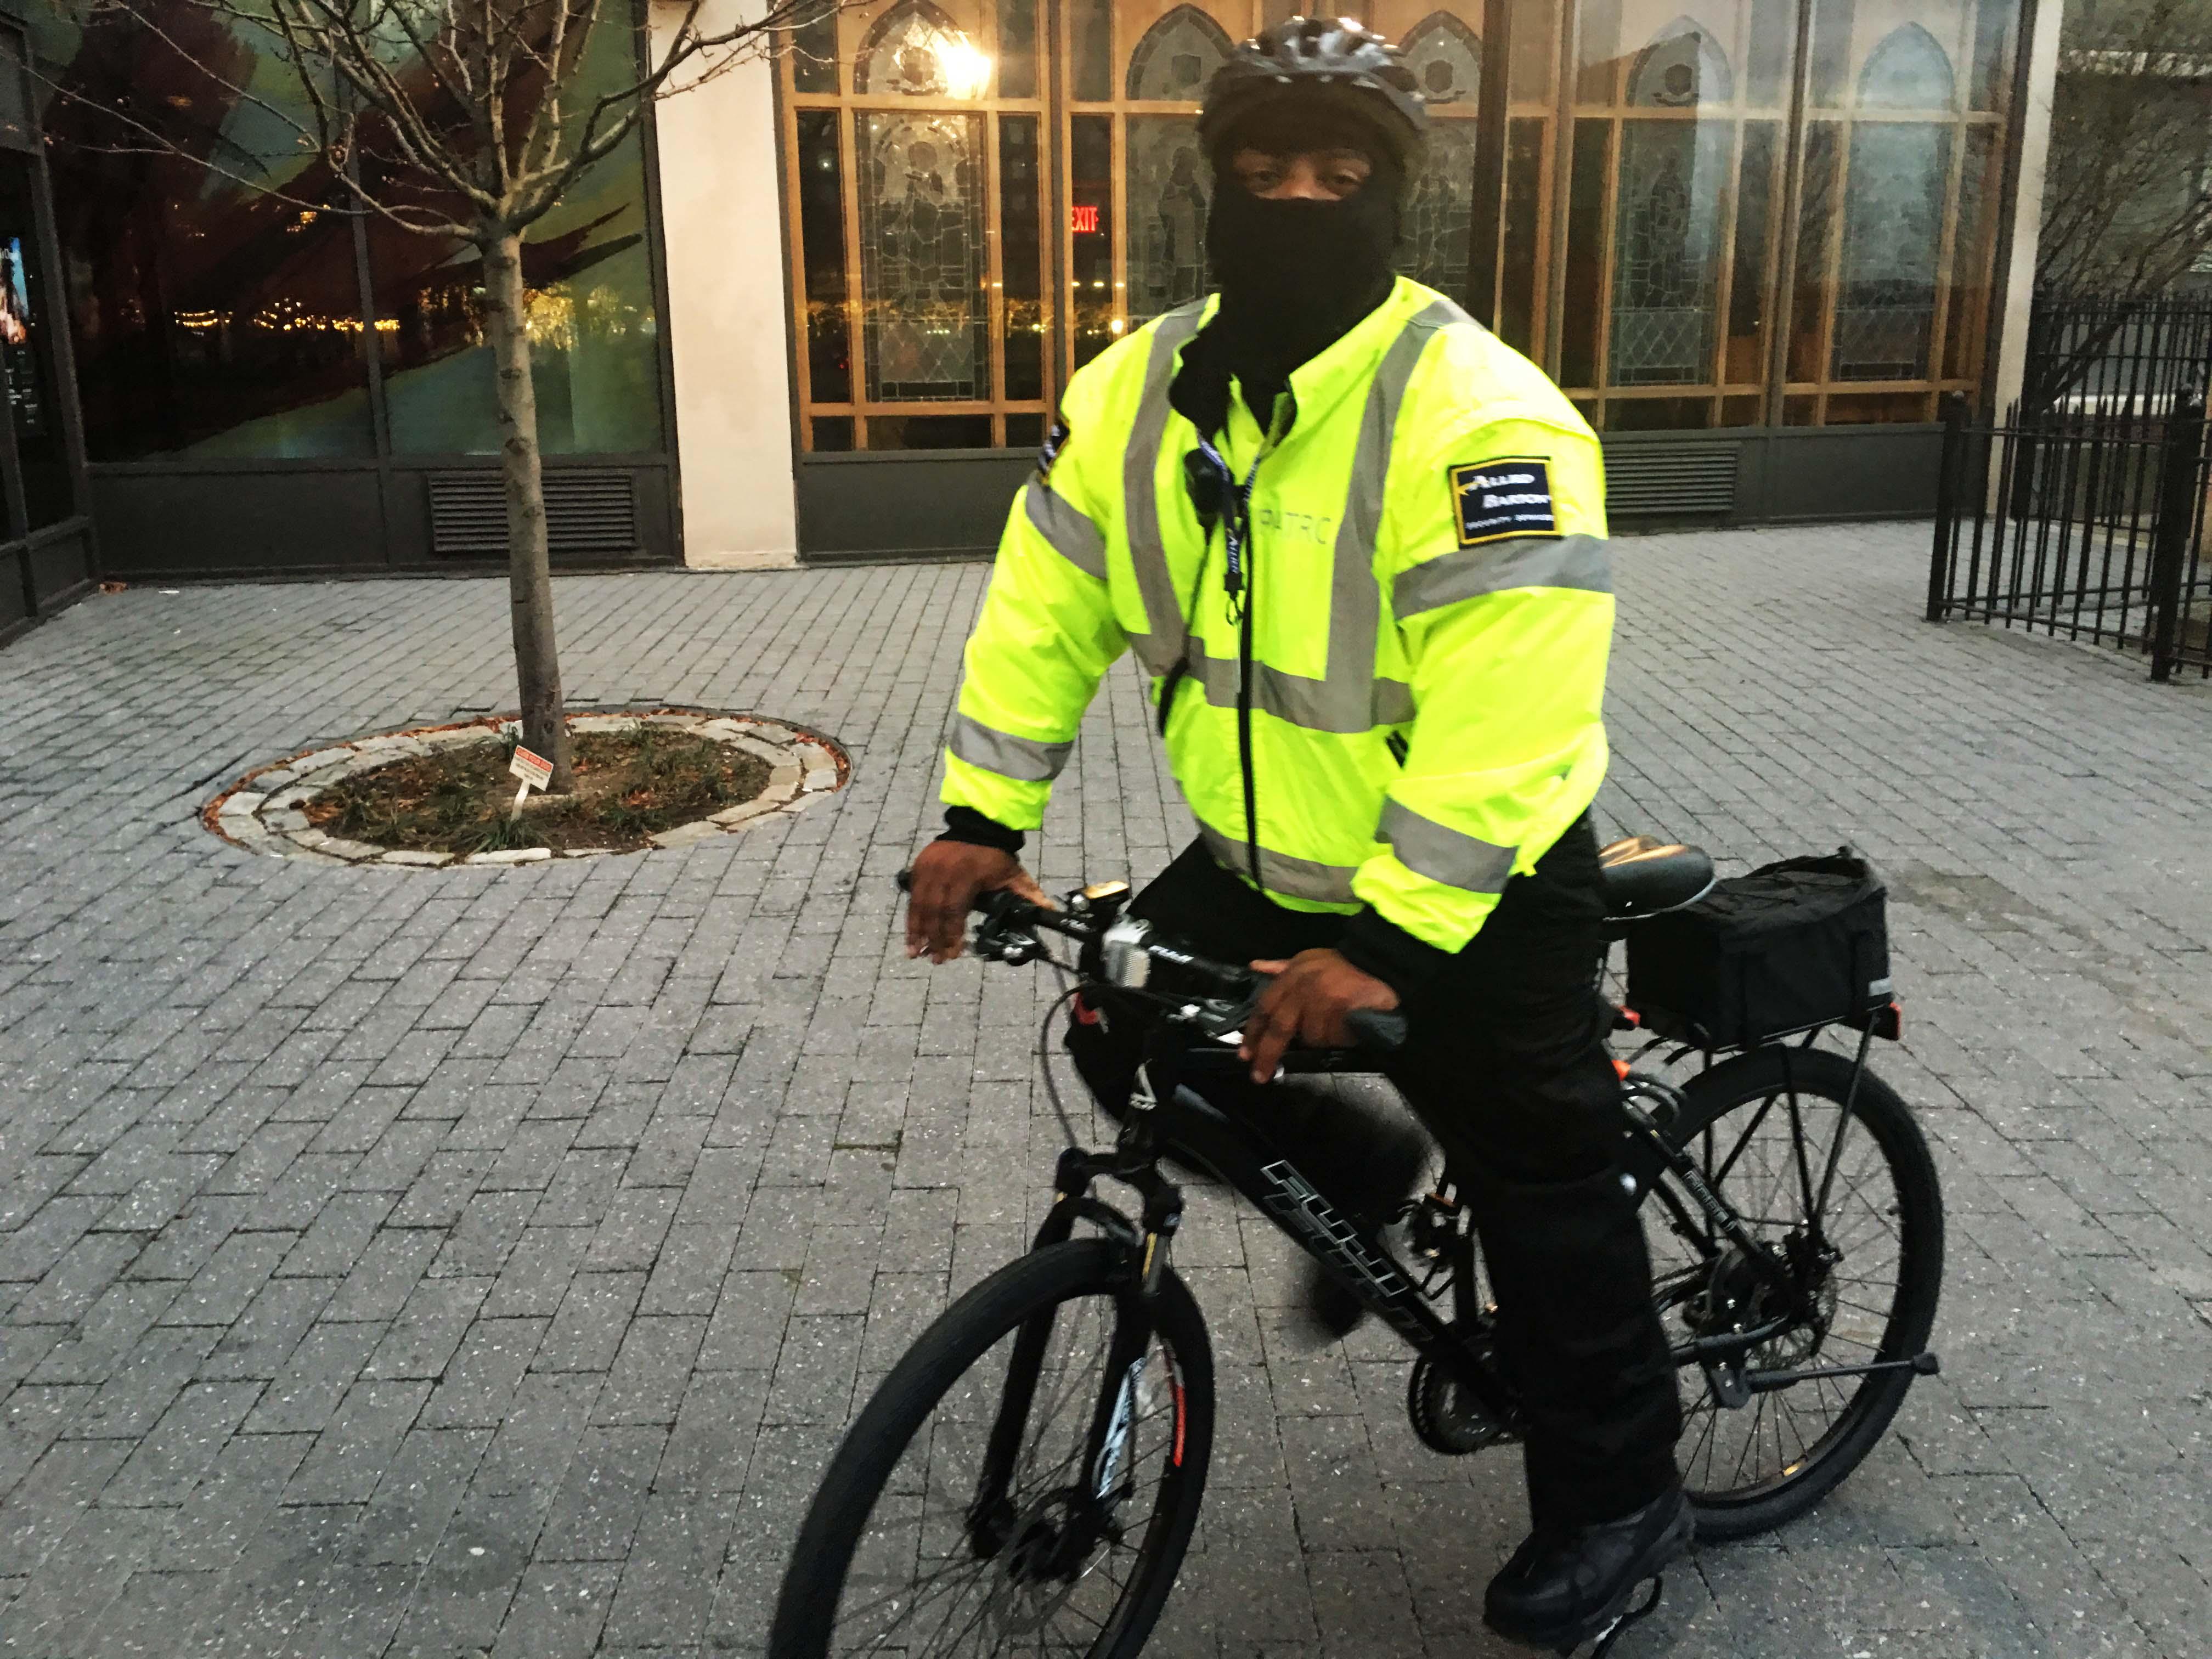 allied barton security guy on bike